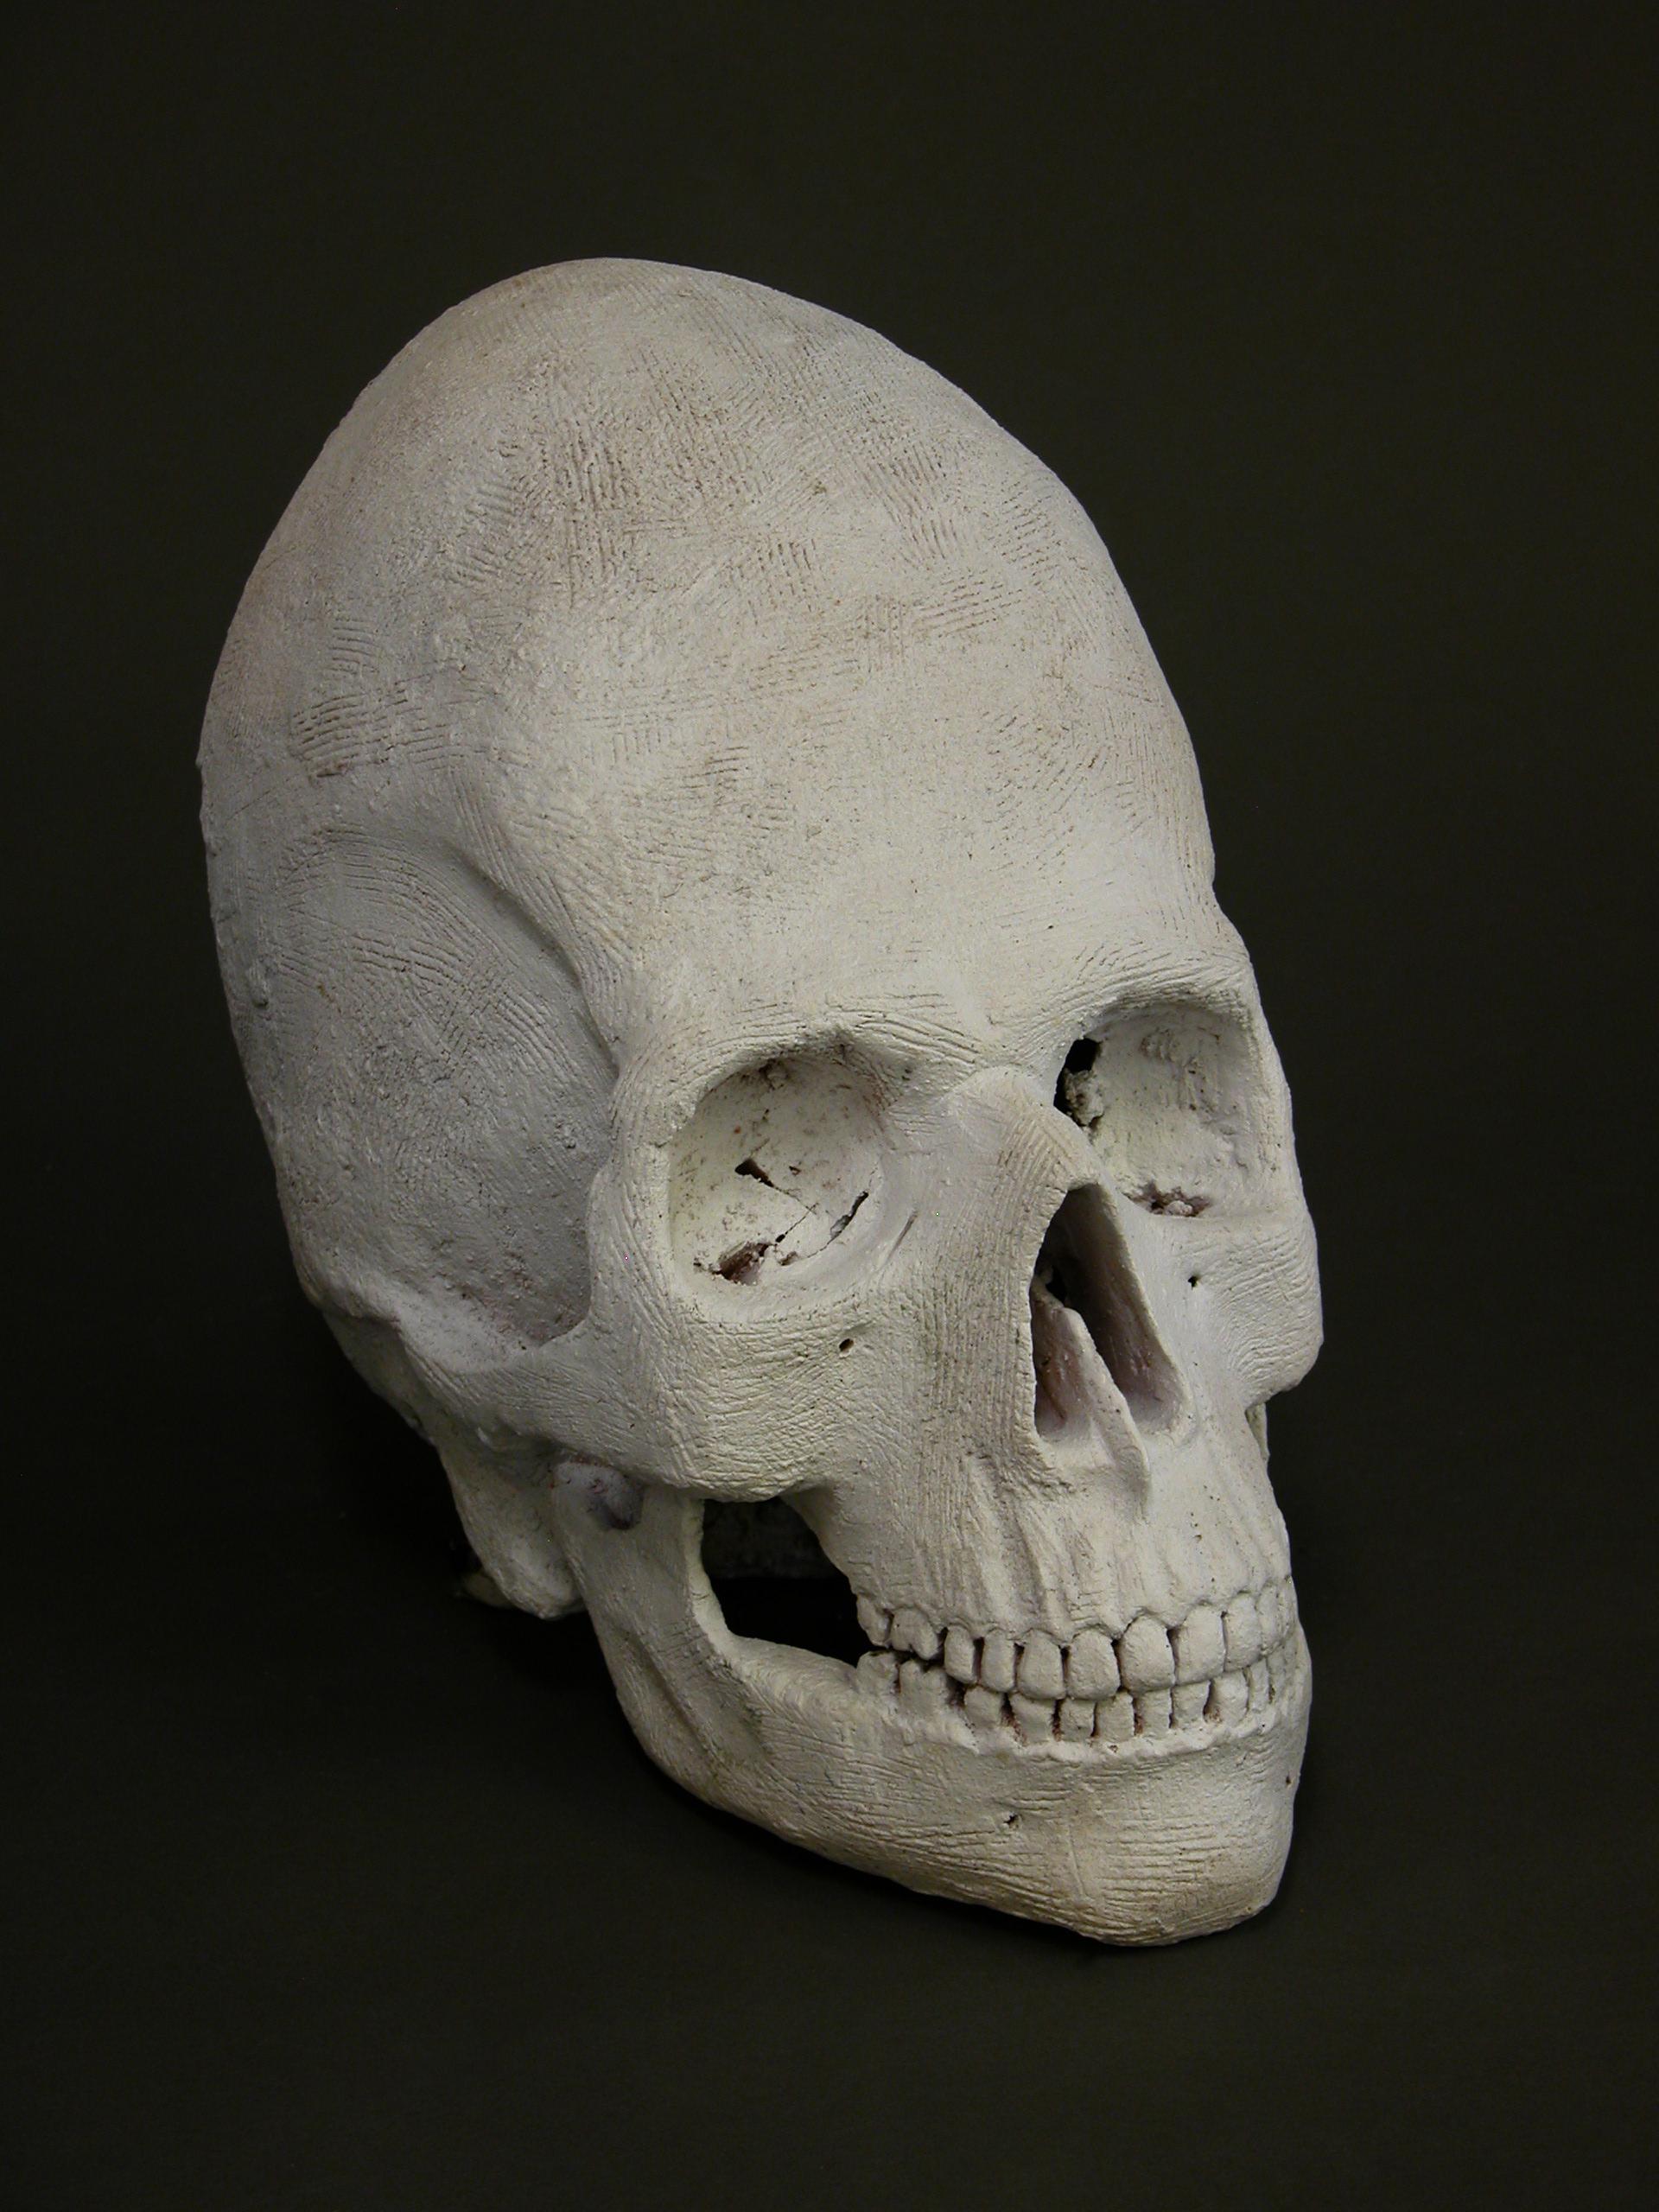 1. Alien Skull Study